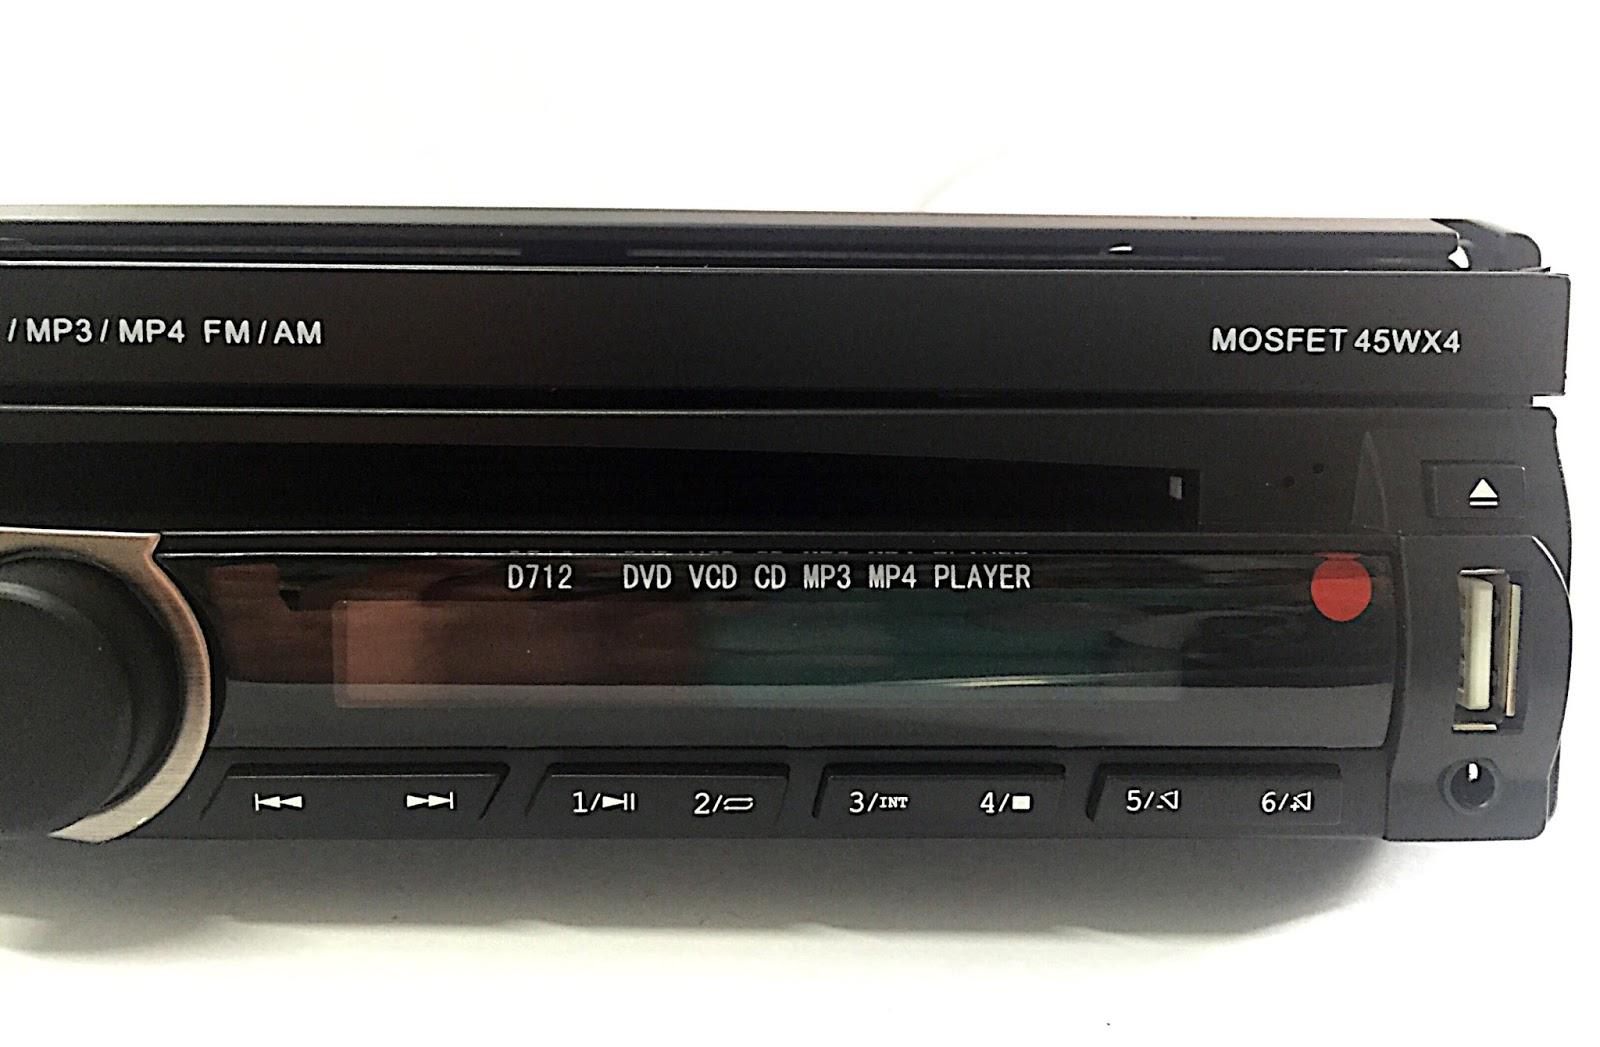 autoradio 1 din stereo 7 gps navigatore auto bluetooth. Black Bedroom Furniture Sets. Home Design Ideas